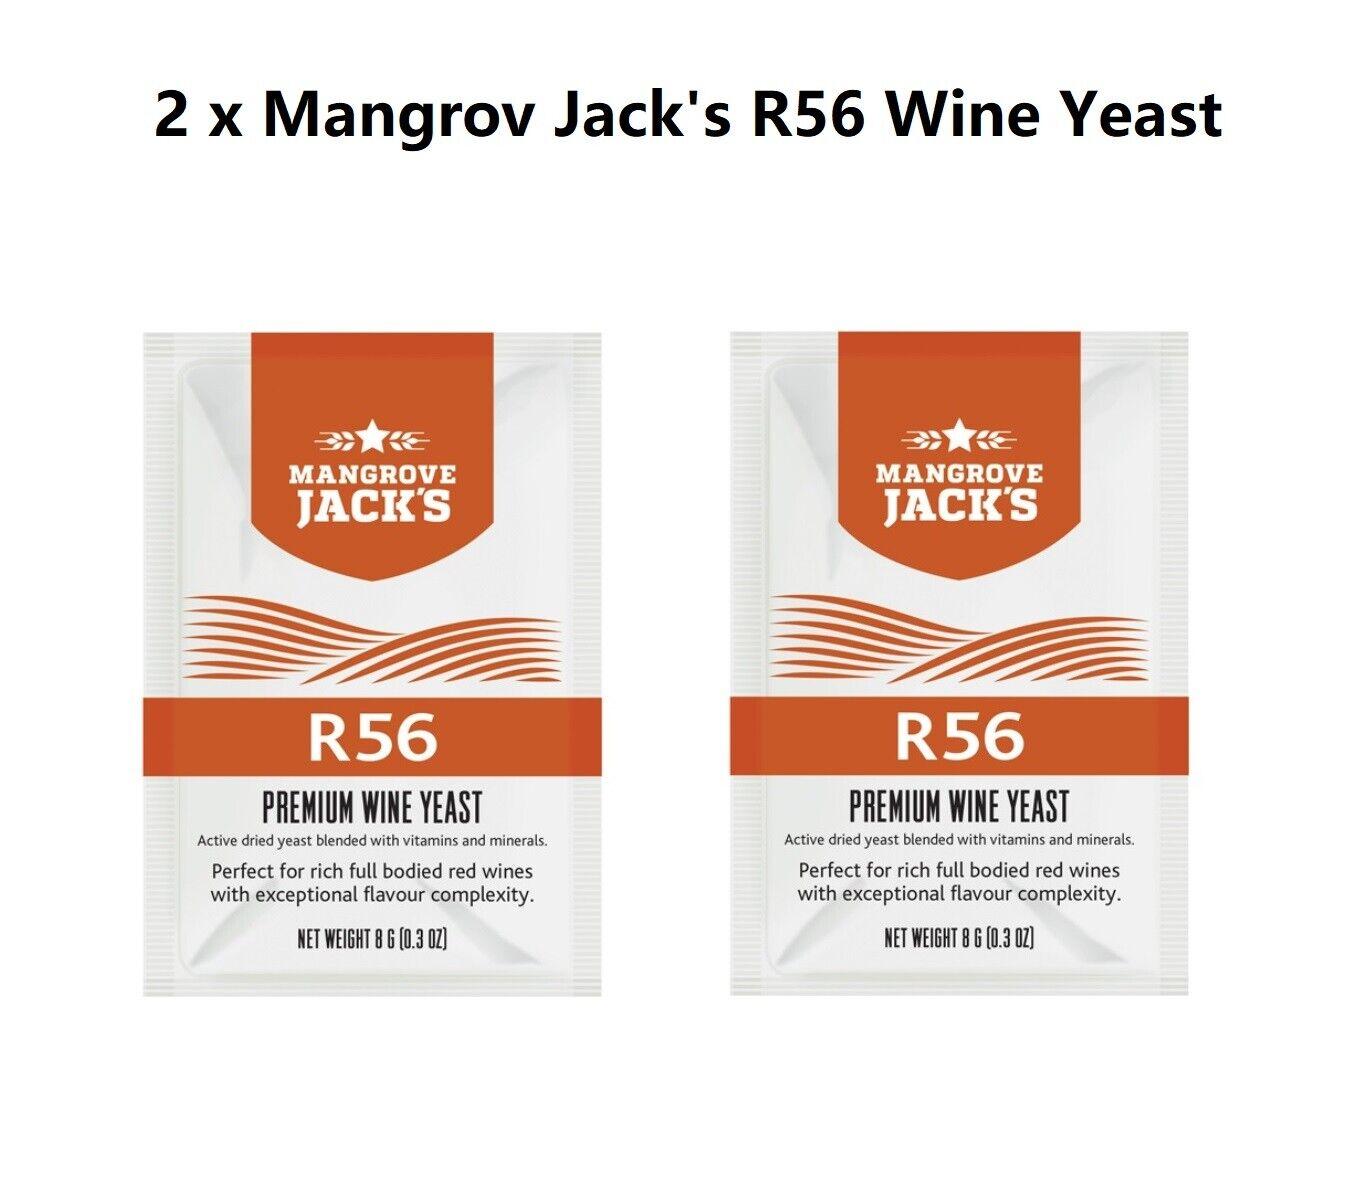 2 x Mangrov Jack's R56 Premium Red Wine Yeast